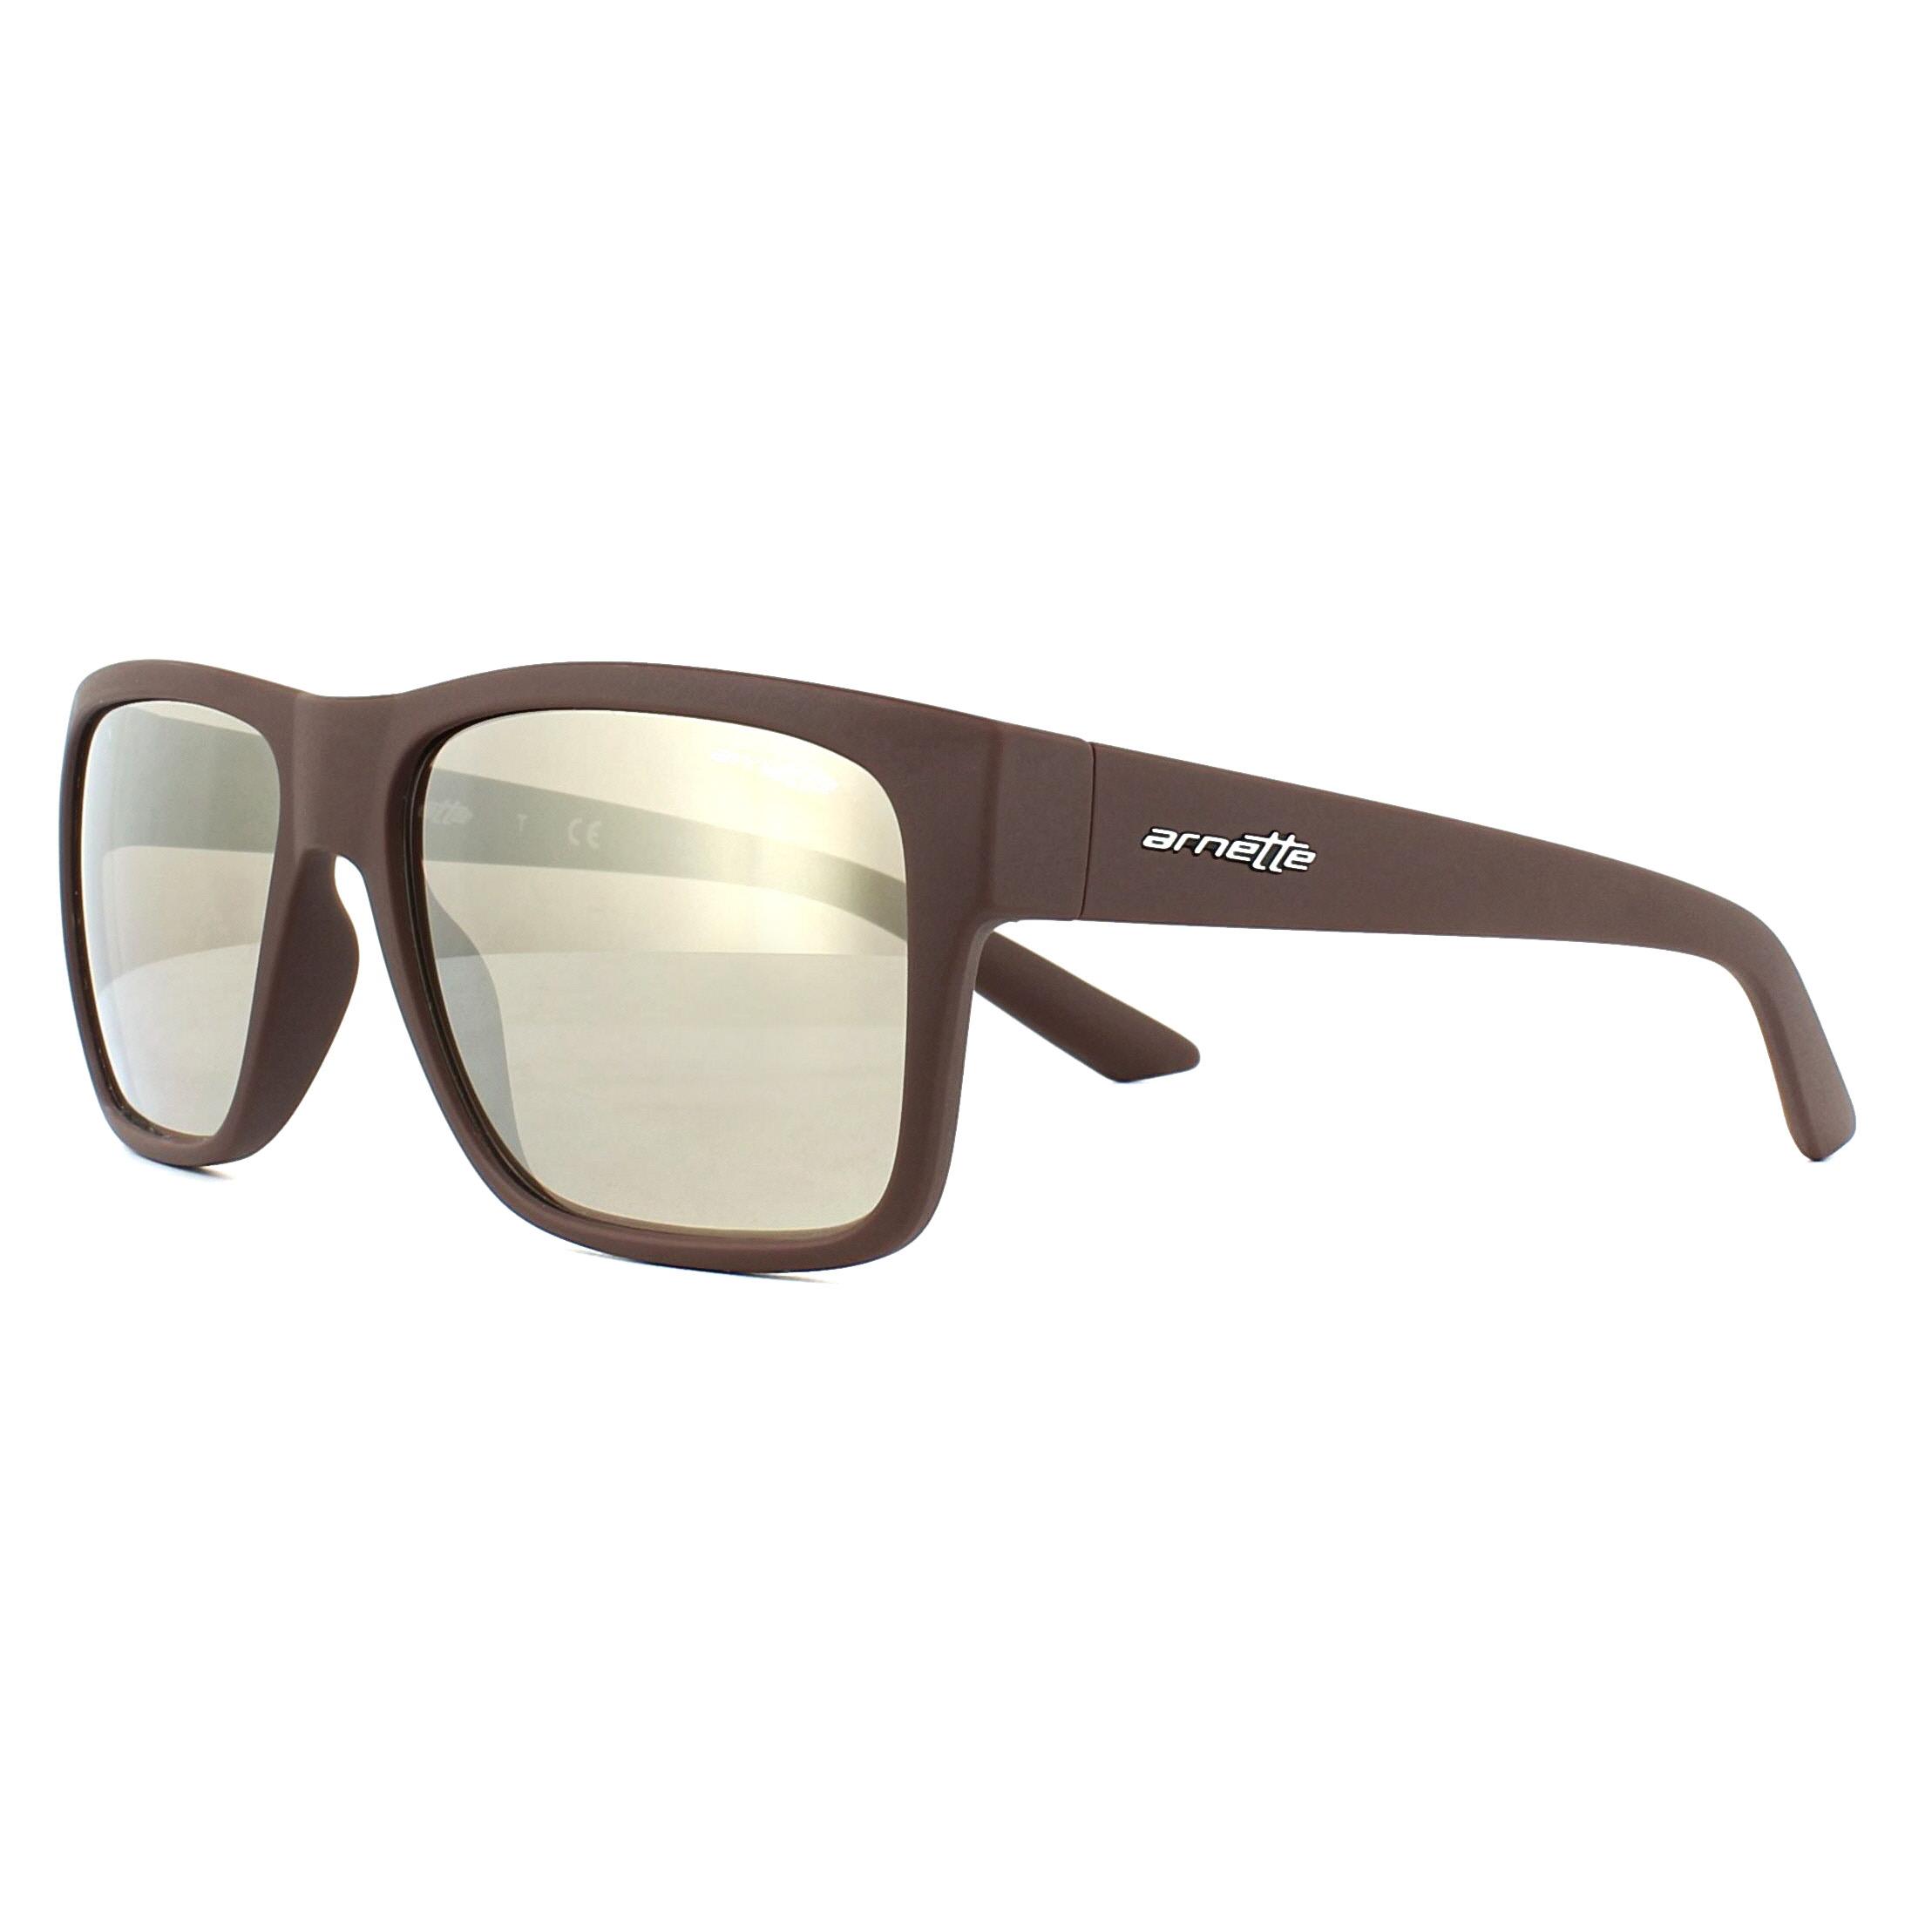 5ca7a3eb8 Sentinel Arnette Sunglasses Reserve 4226 23805A Matt Brown Brown Mirror  Gold. Sentinel Thumbnail 2